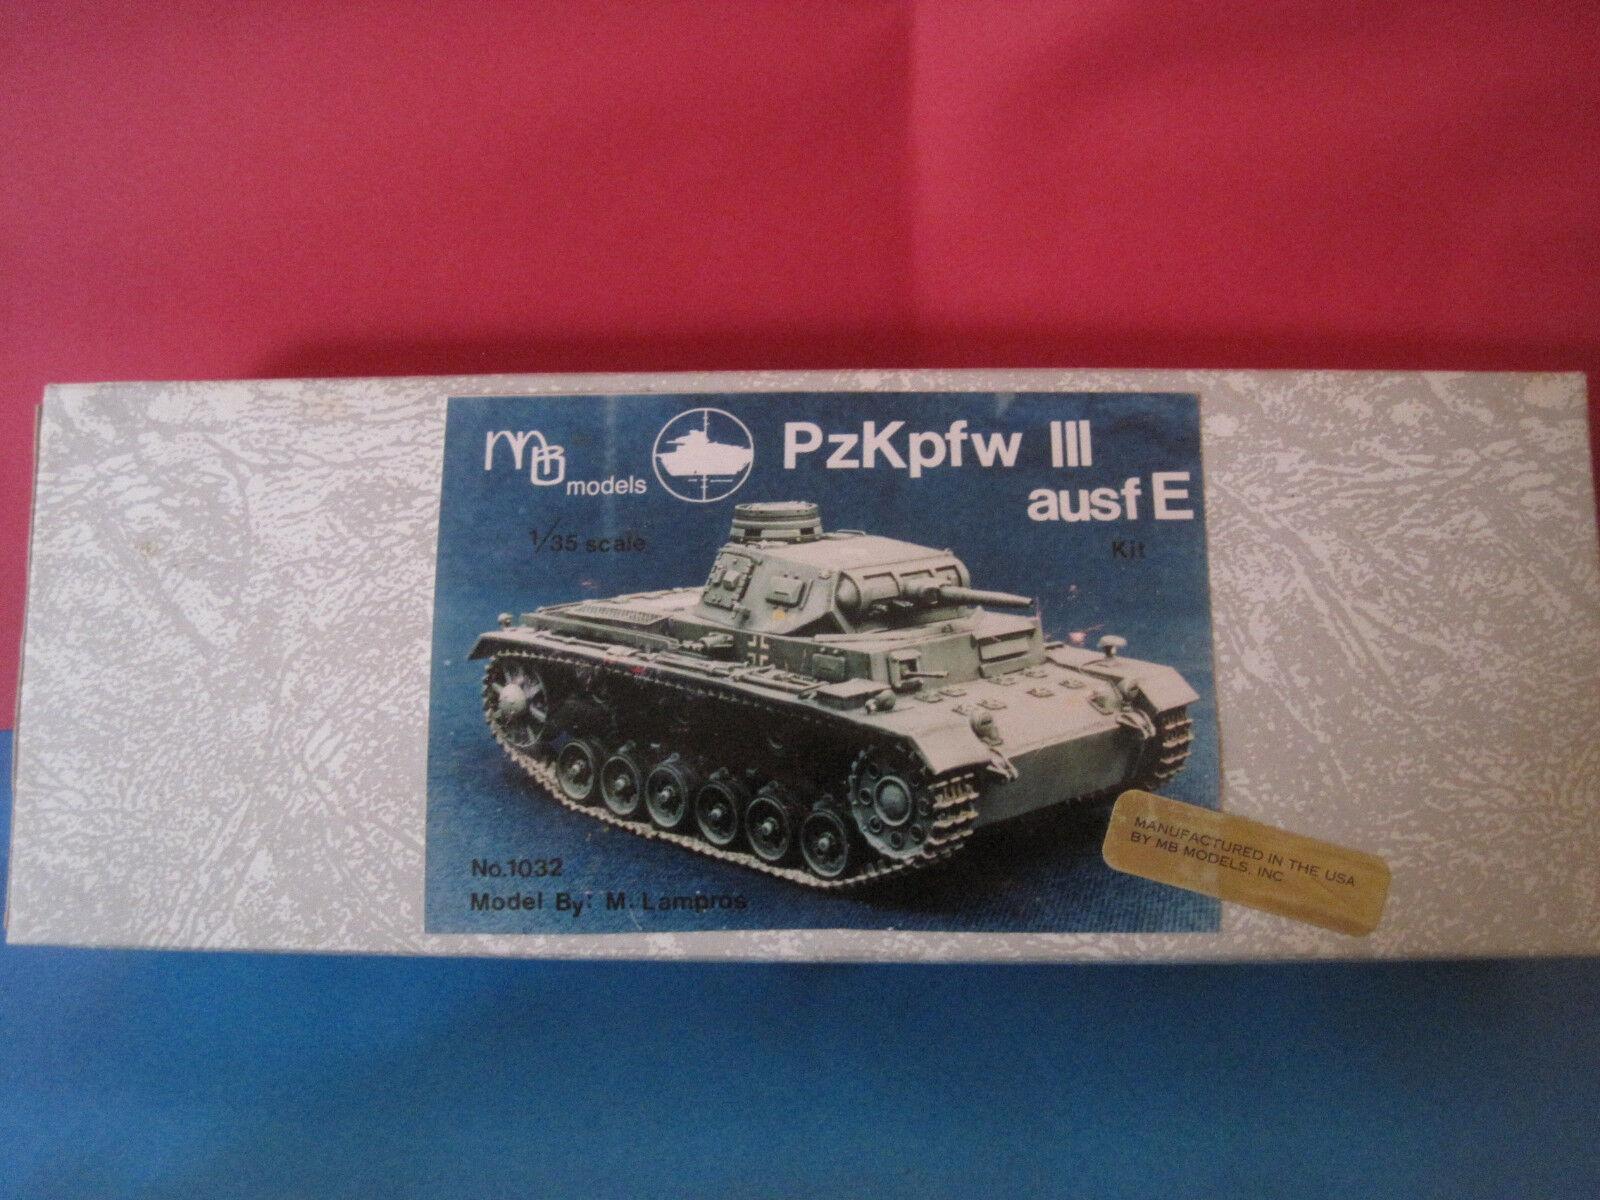 tomamos a los clientes como nuestro dios MB MB MB MODELS KIT RESINE METAL A MONTER CHAR TANK PzKpfw III ausf E  ech 1 35  tienda en linea